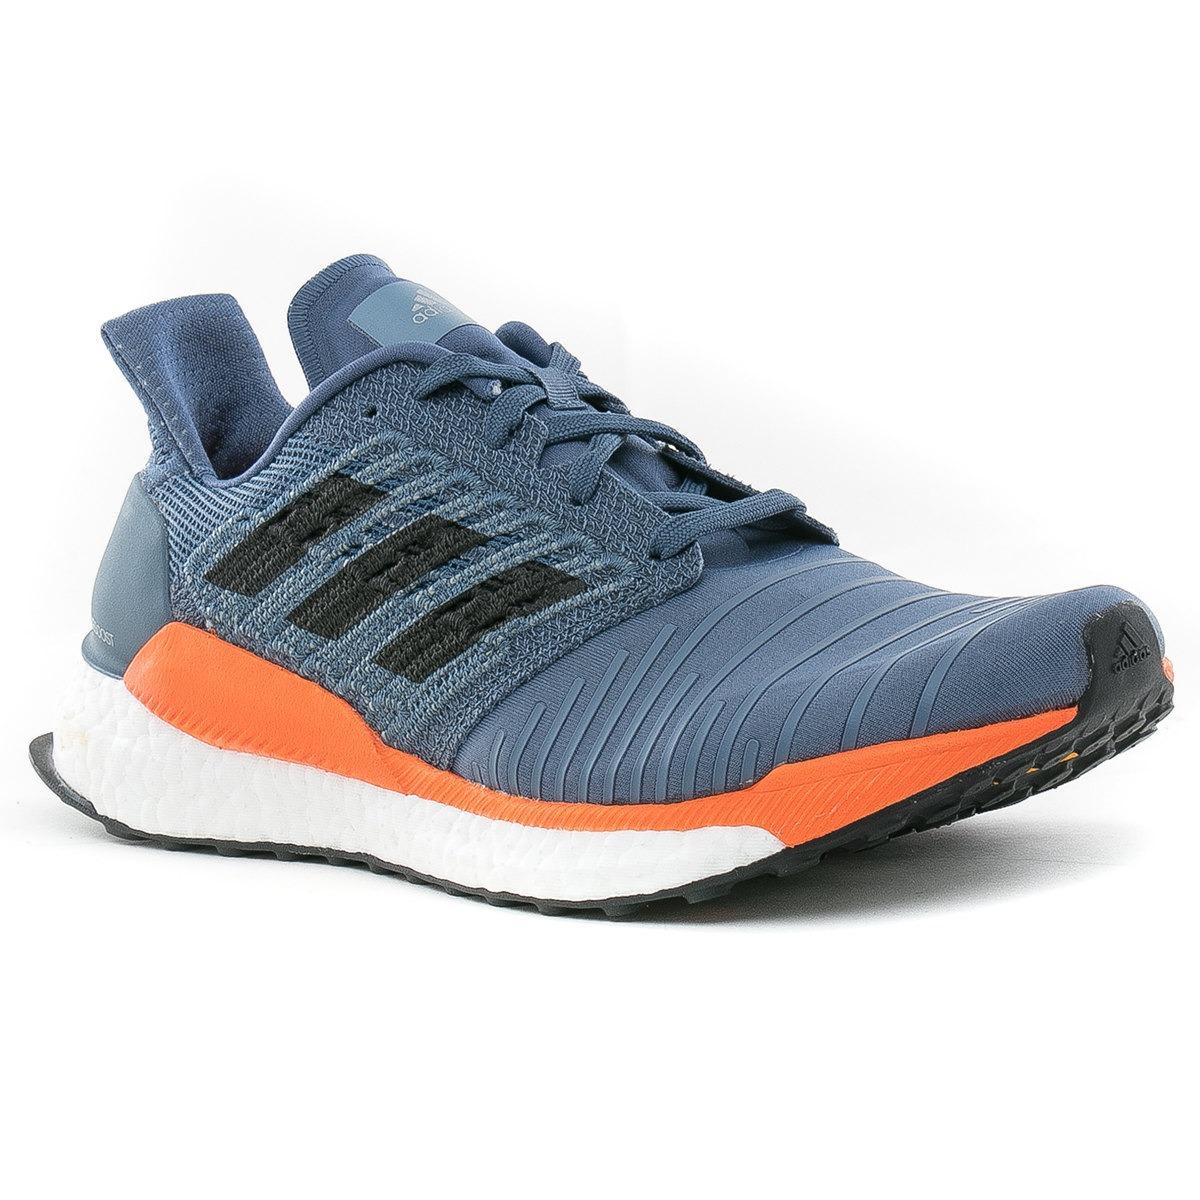 zapatillas solar boost m tech ink adidas. Cargando zoom. 4b51fb1701b34